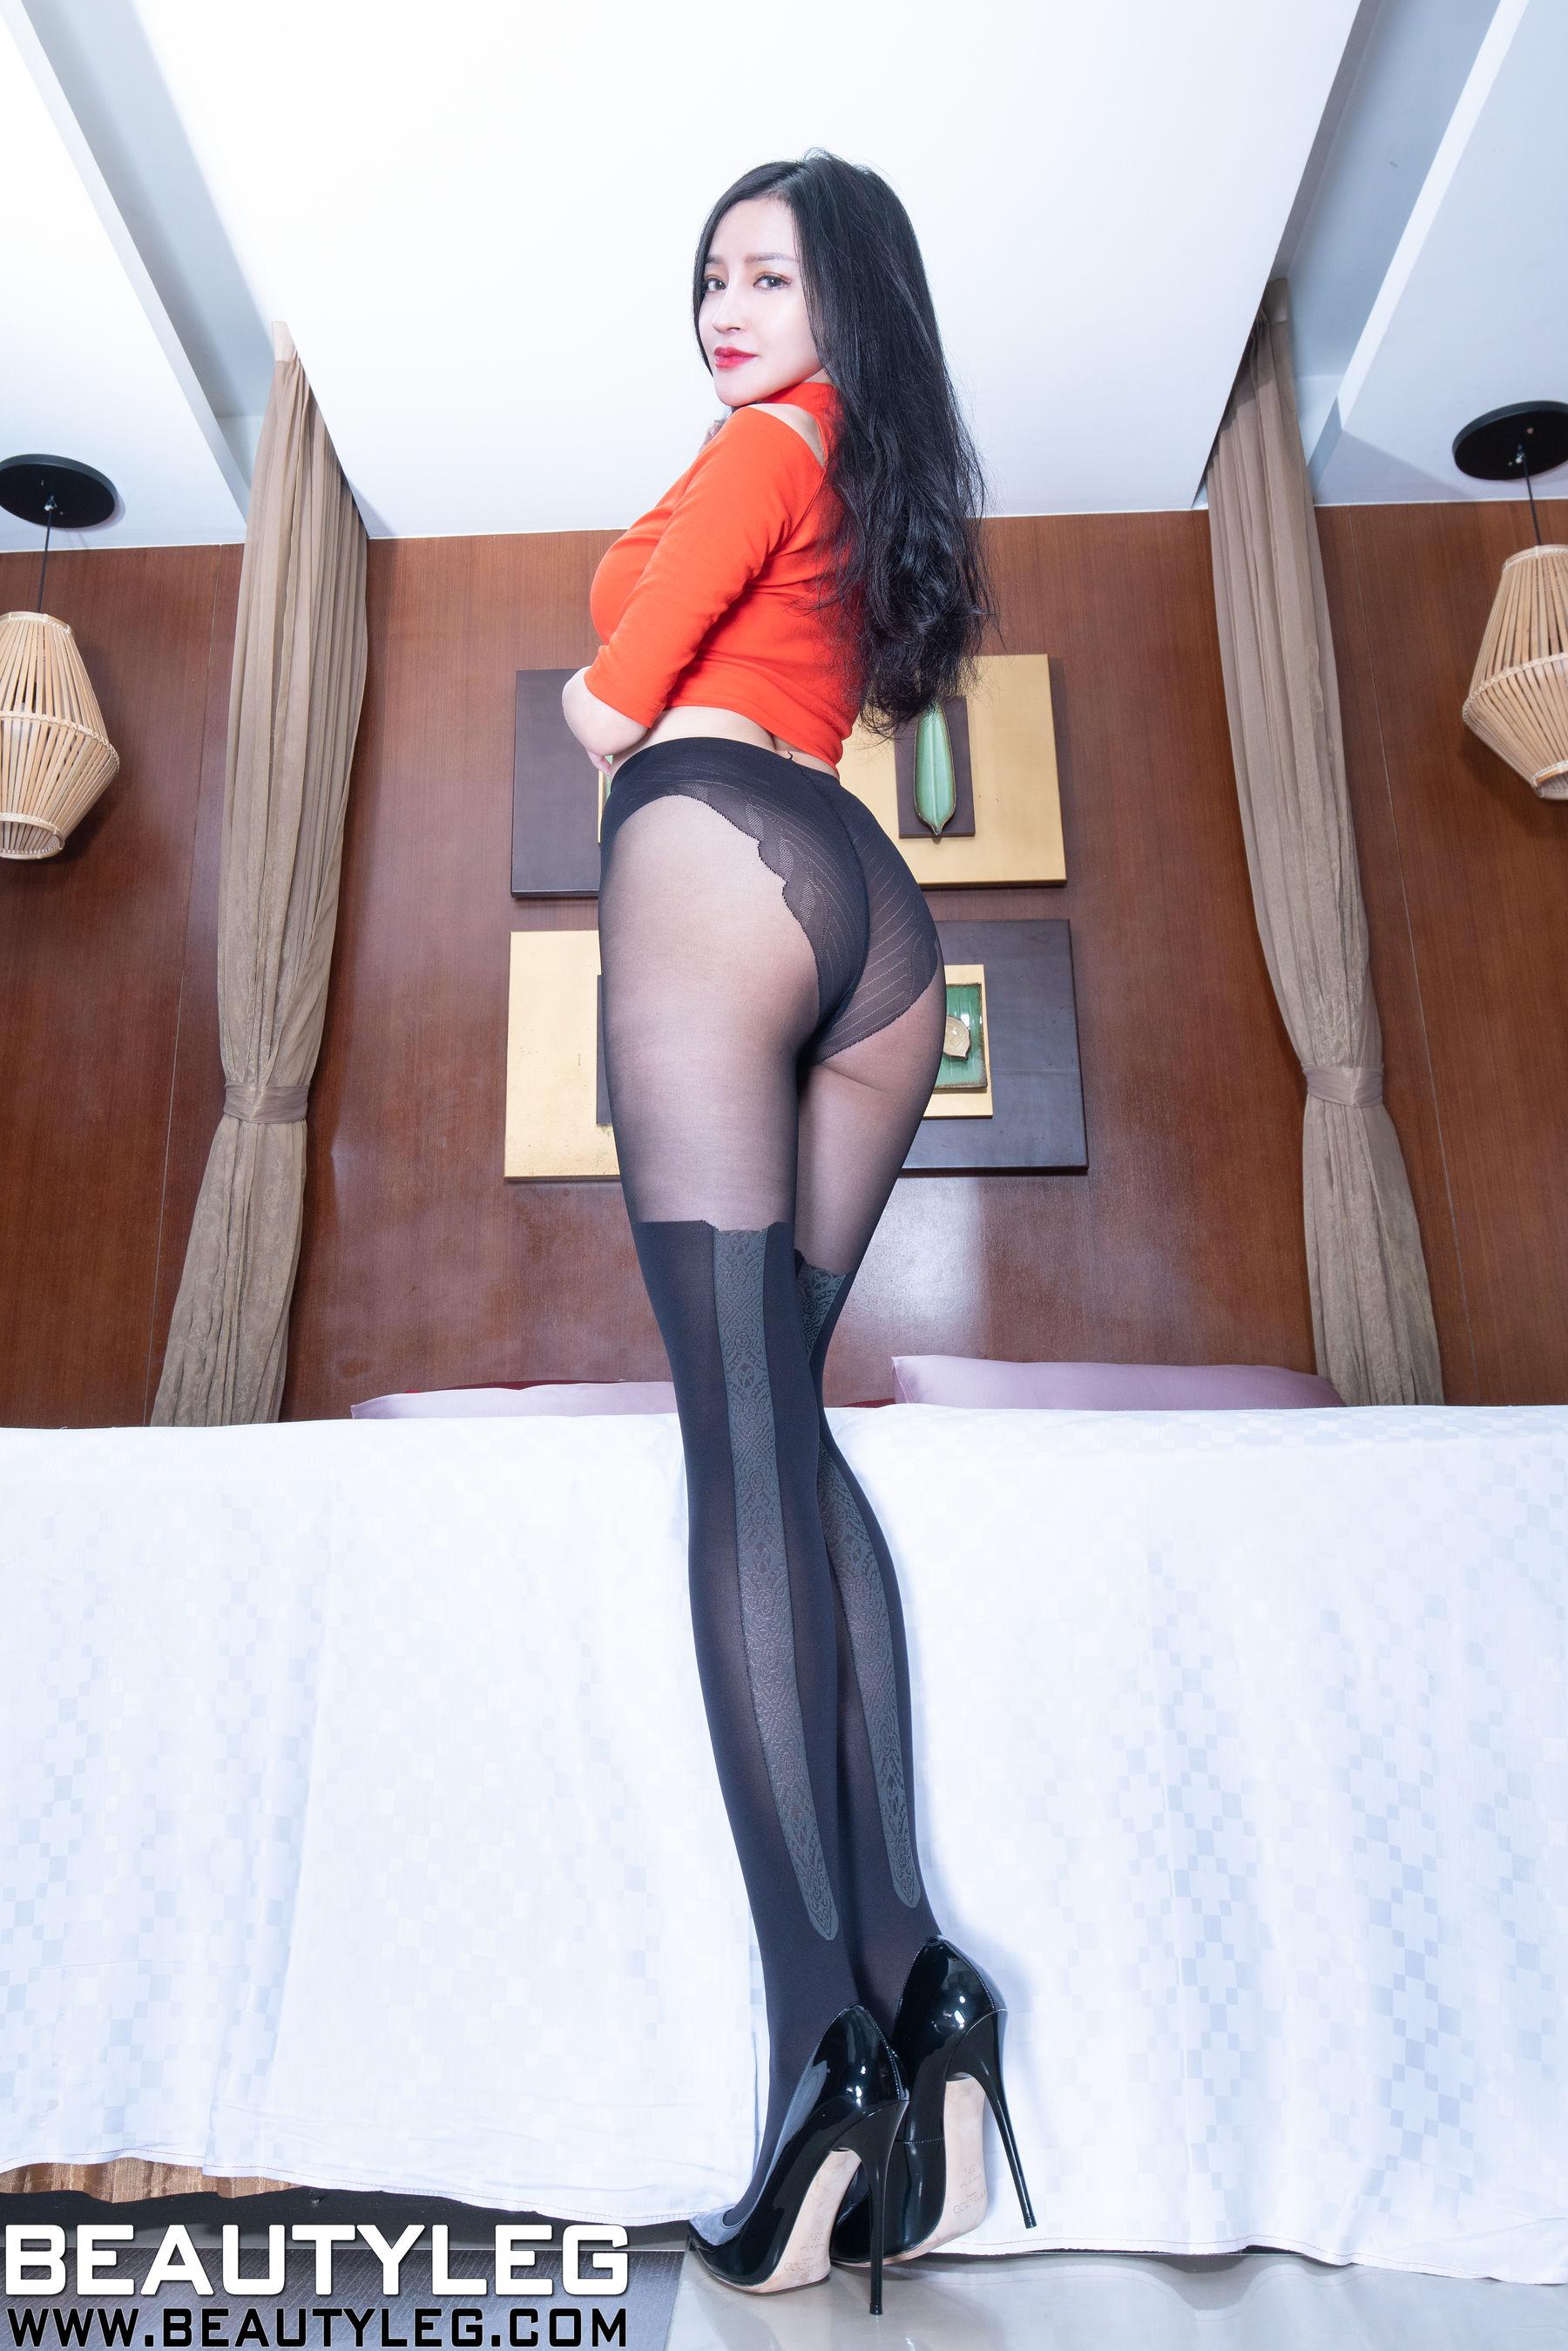 VOL.730 [Beautyleg]丝袜美腿高跟:詹艾葳(腿模Avril,腿模Arvil)超高清个人性感漂亮大图(55P)